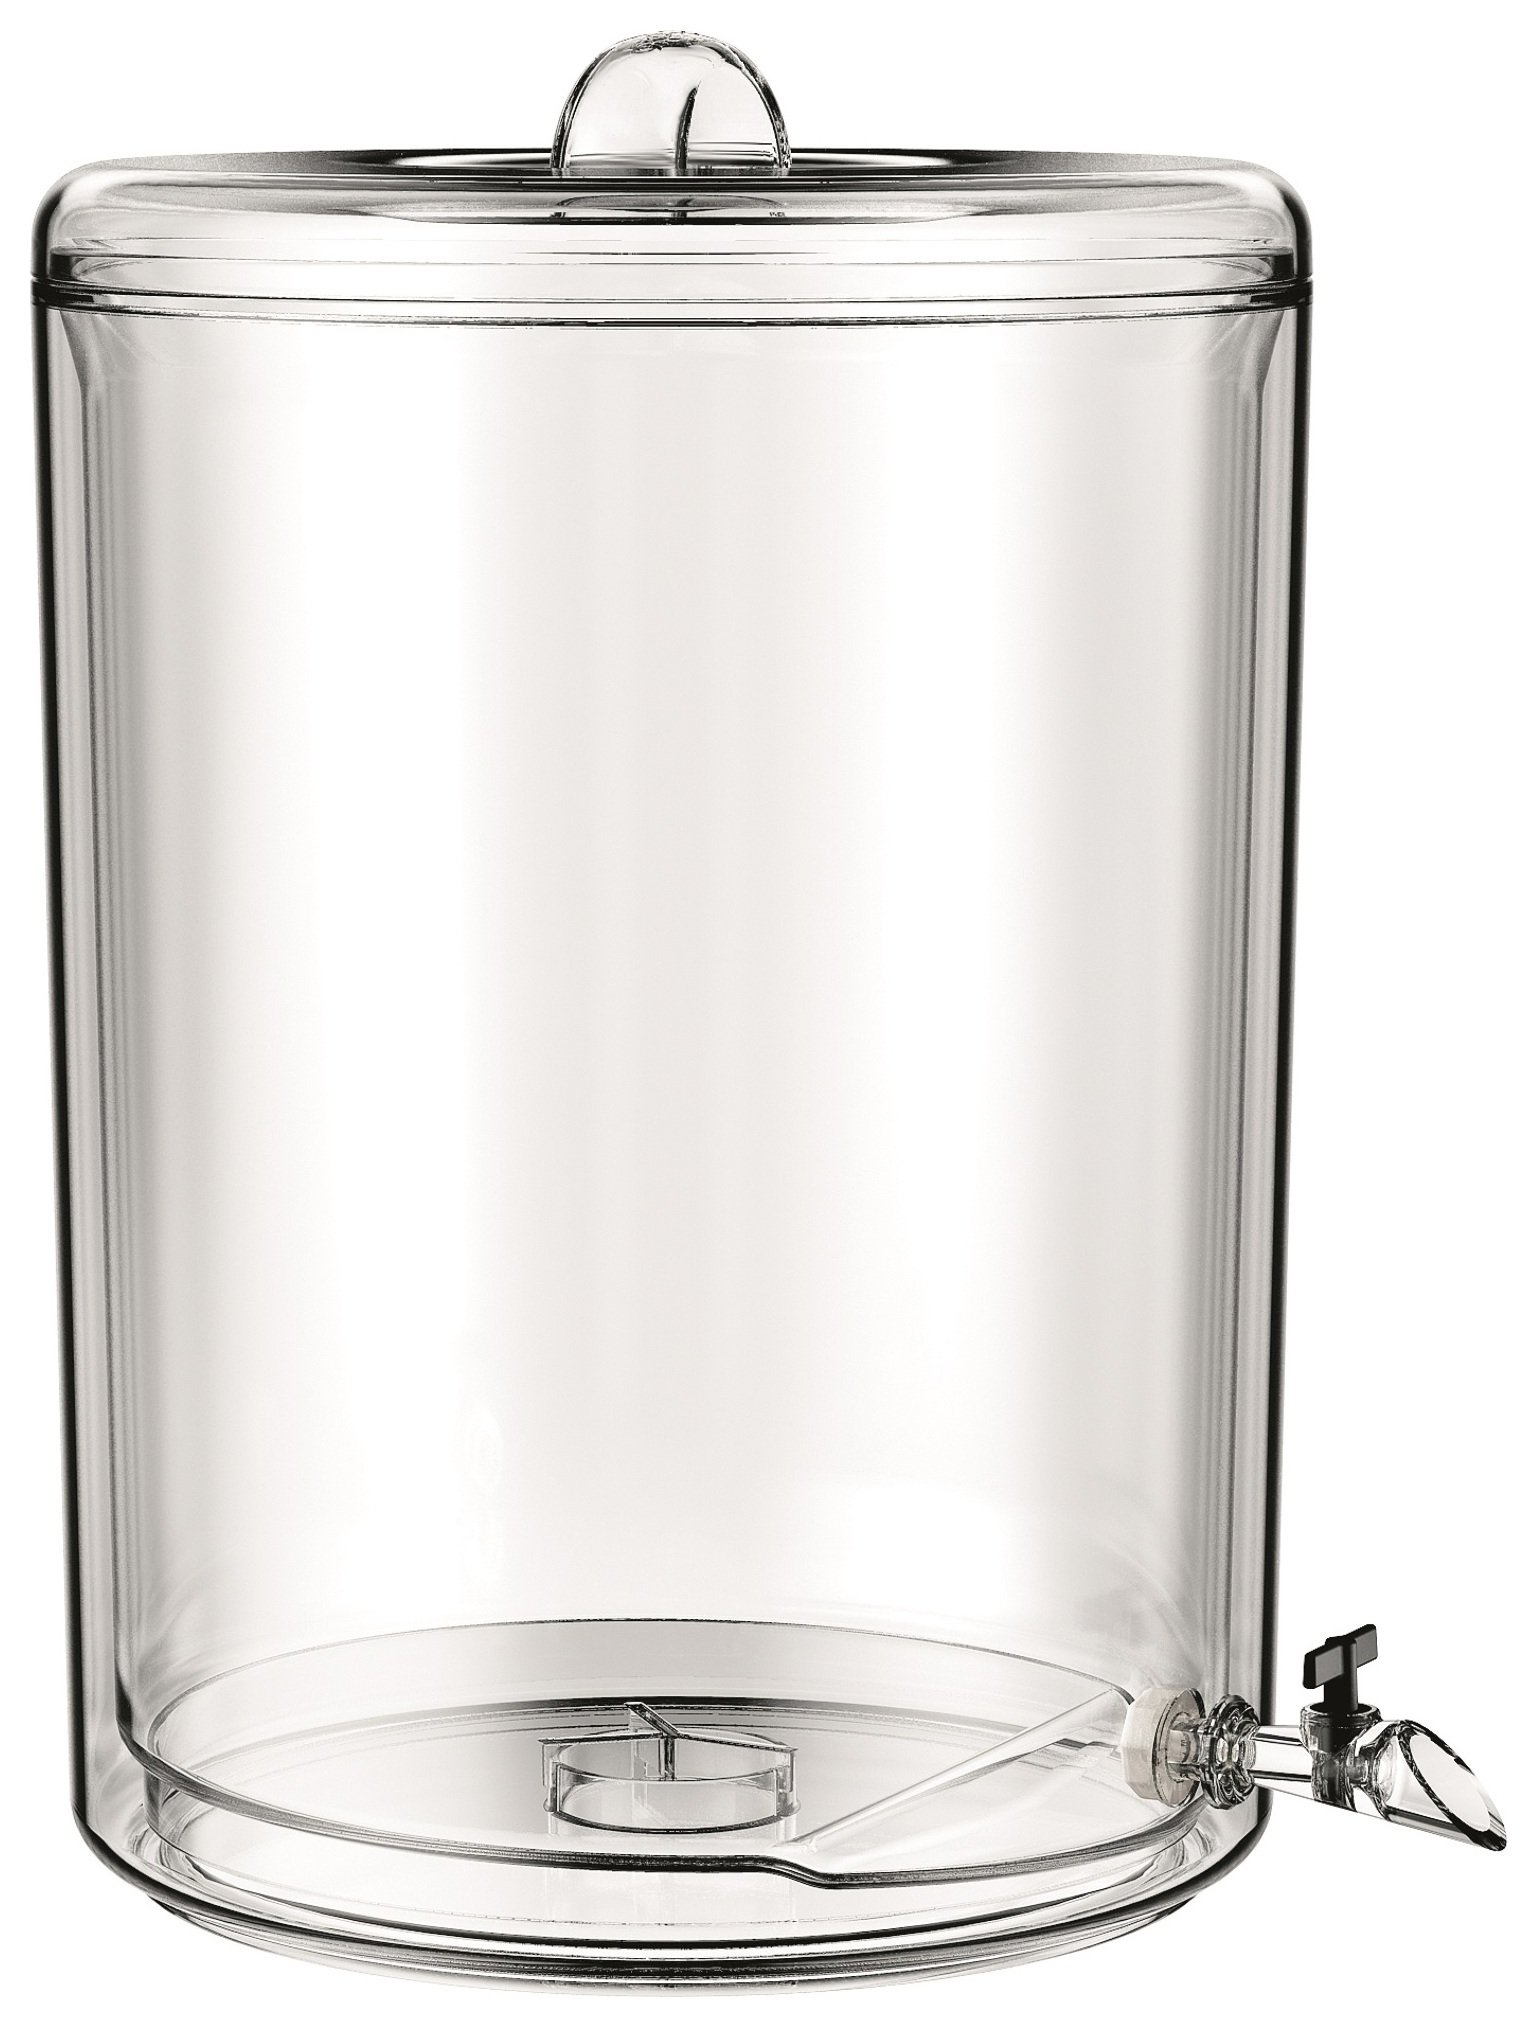 Image of Bodum Melior Double Drink Dispenser